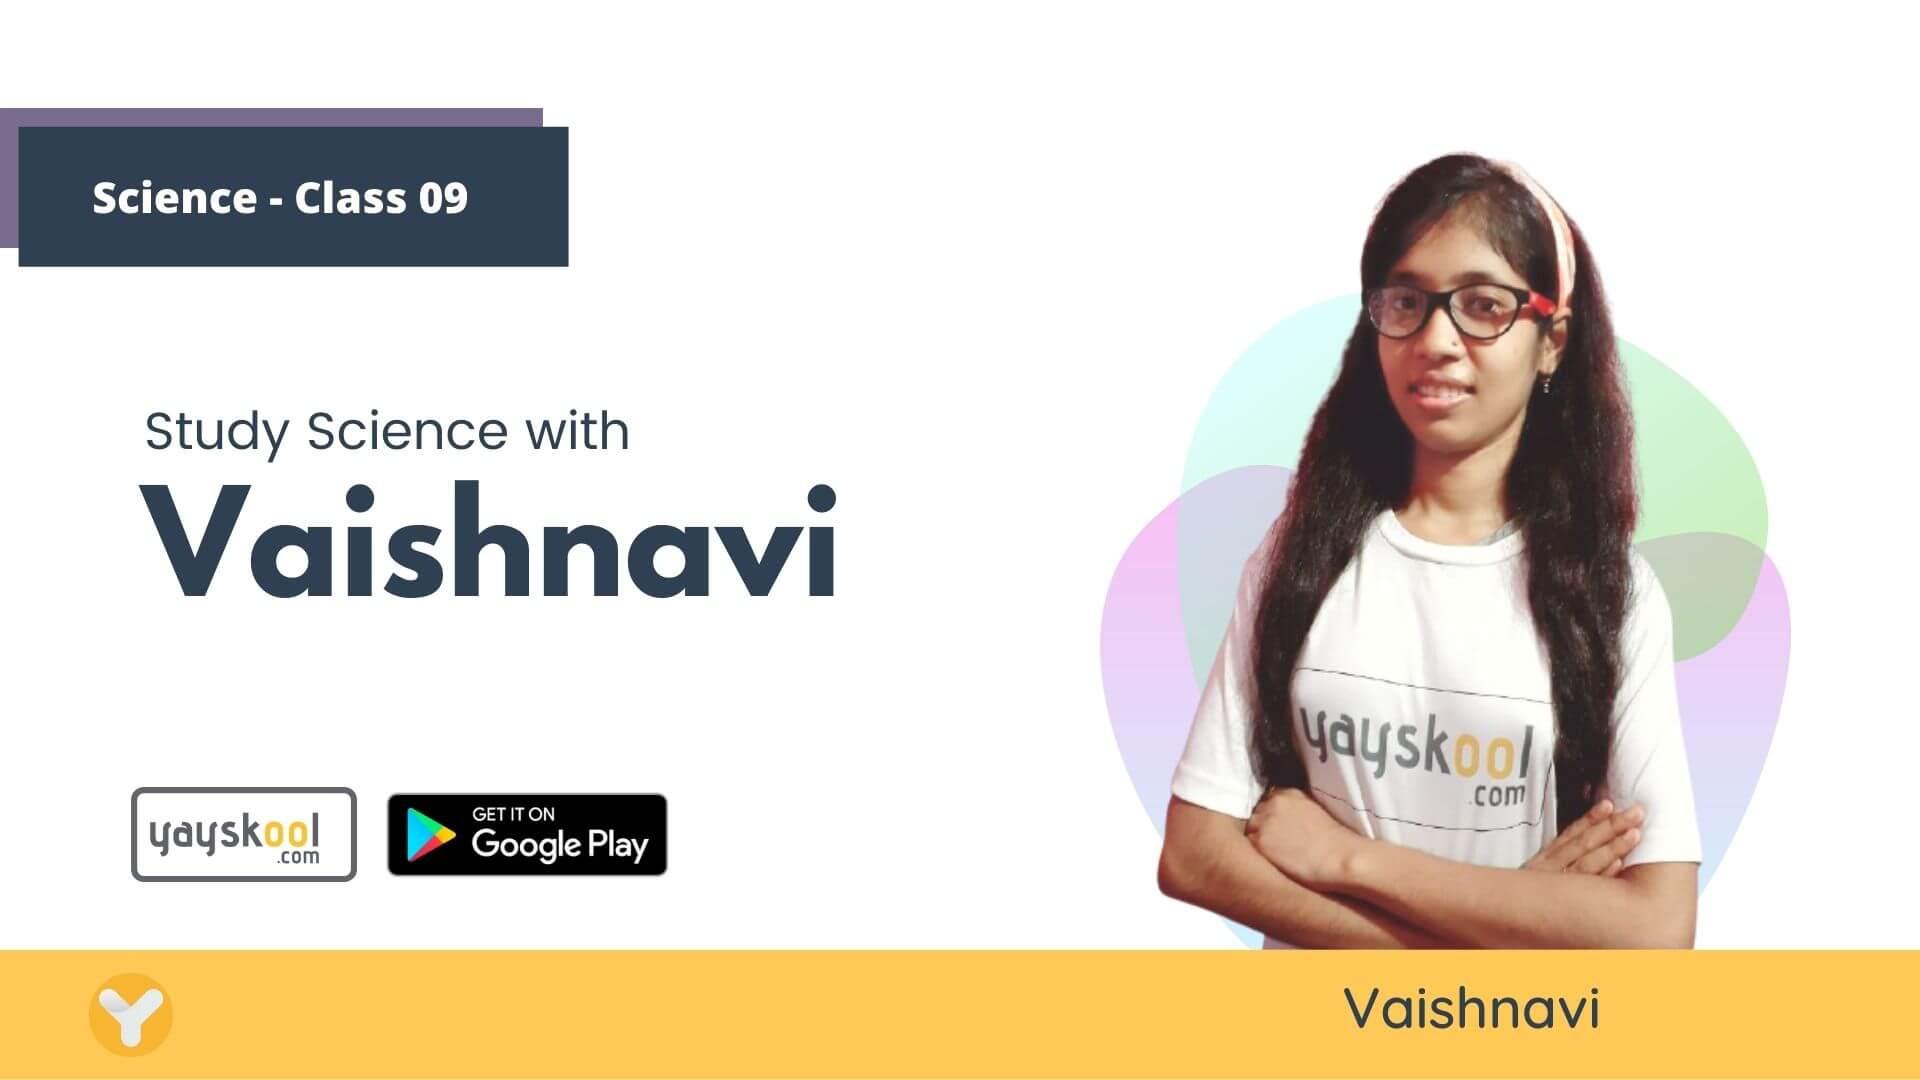 science-course-class09-vaishnavi